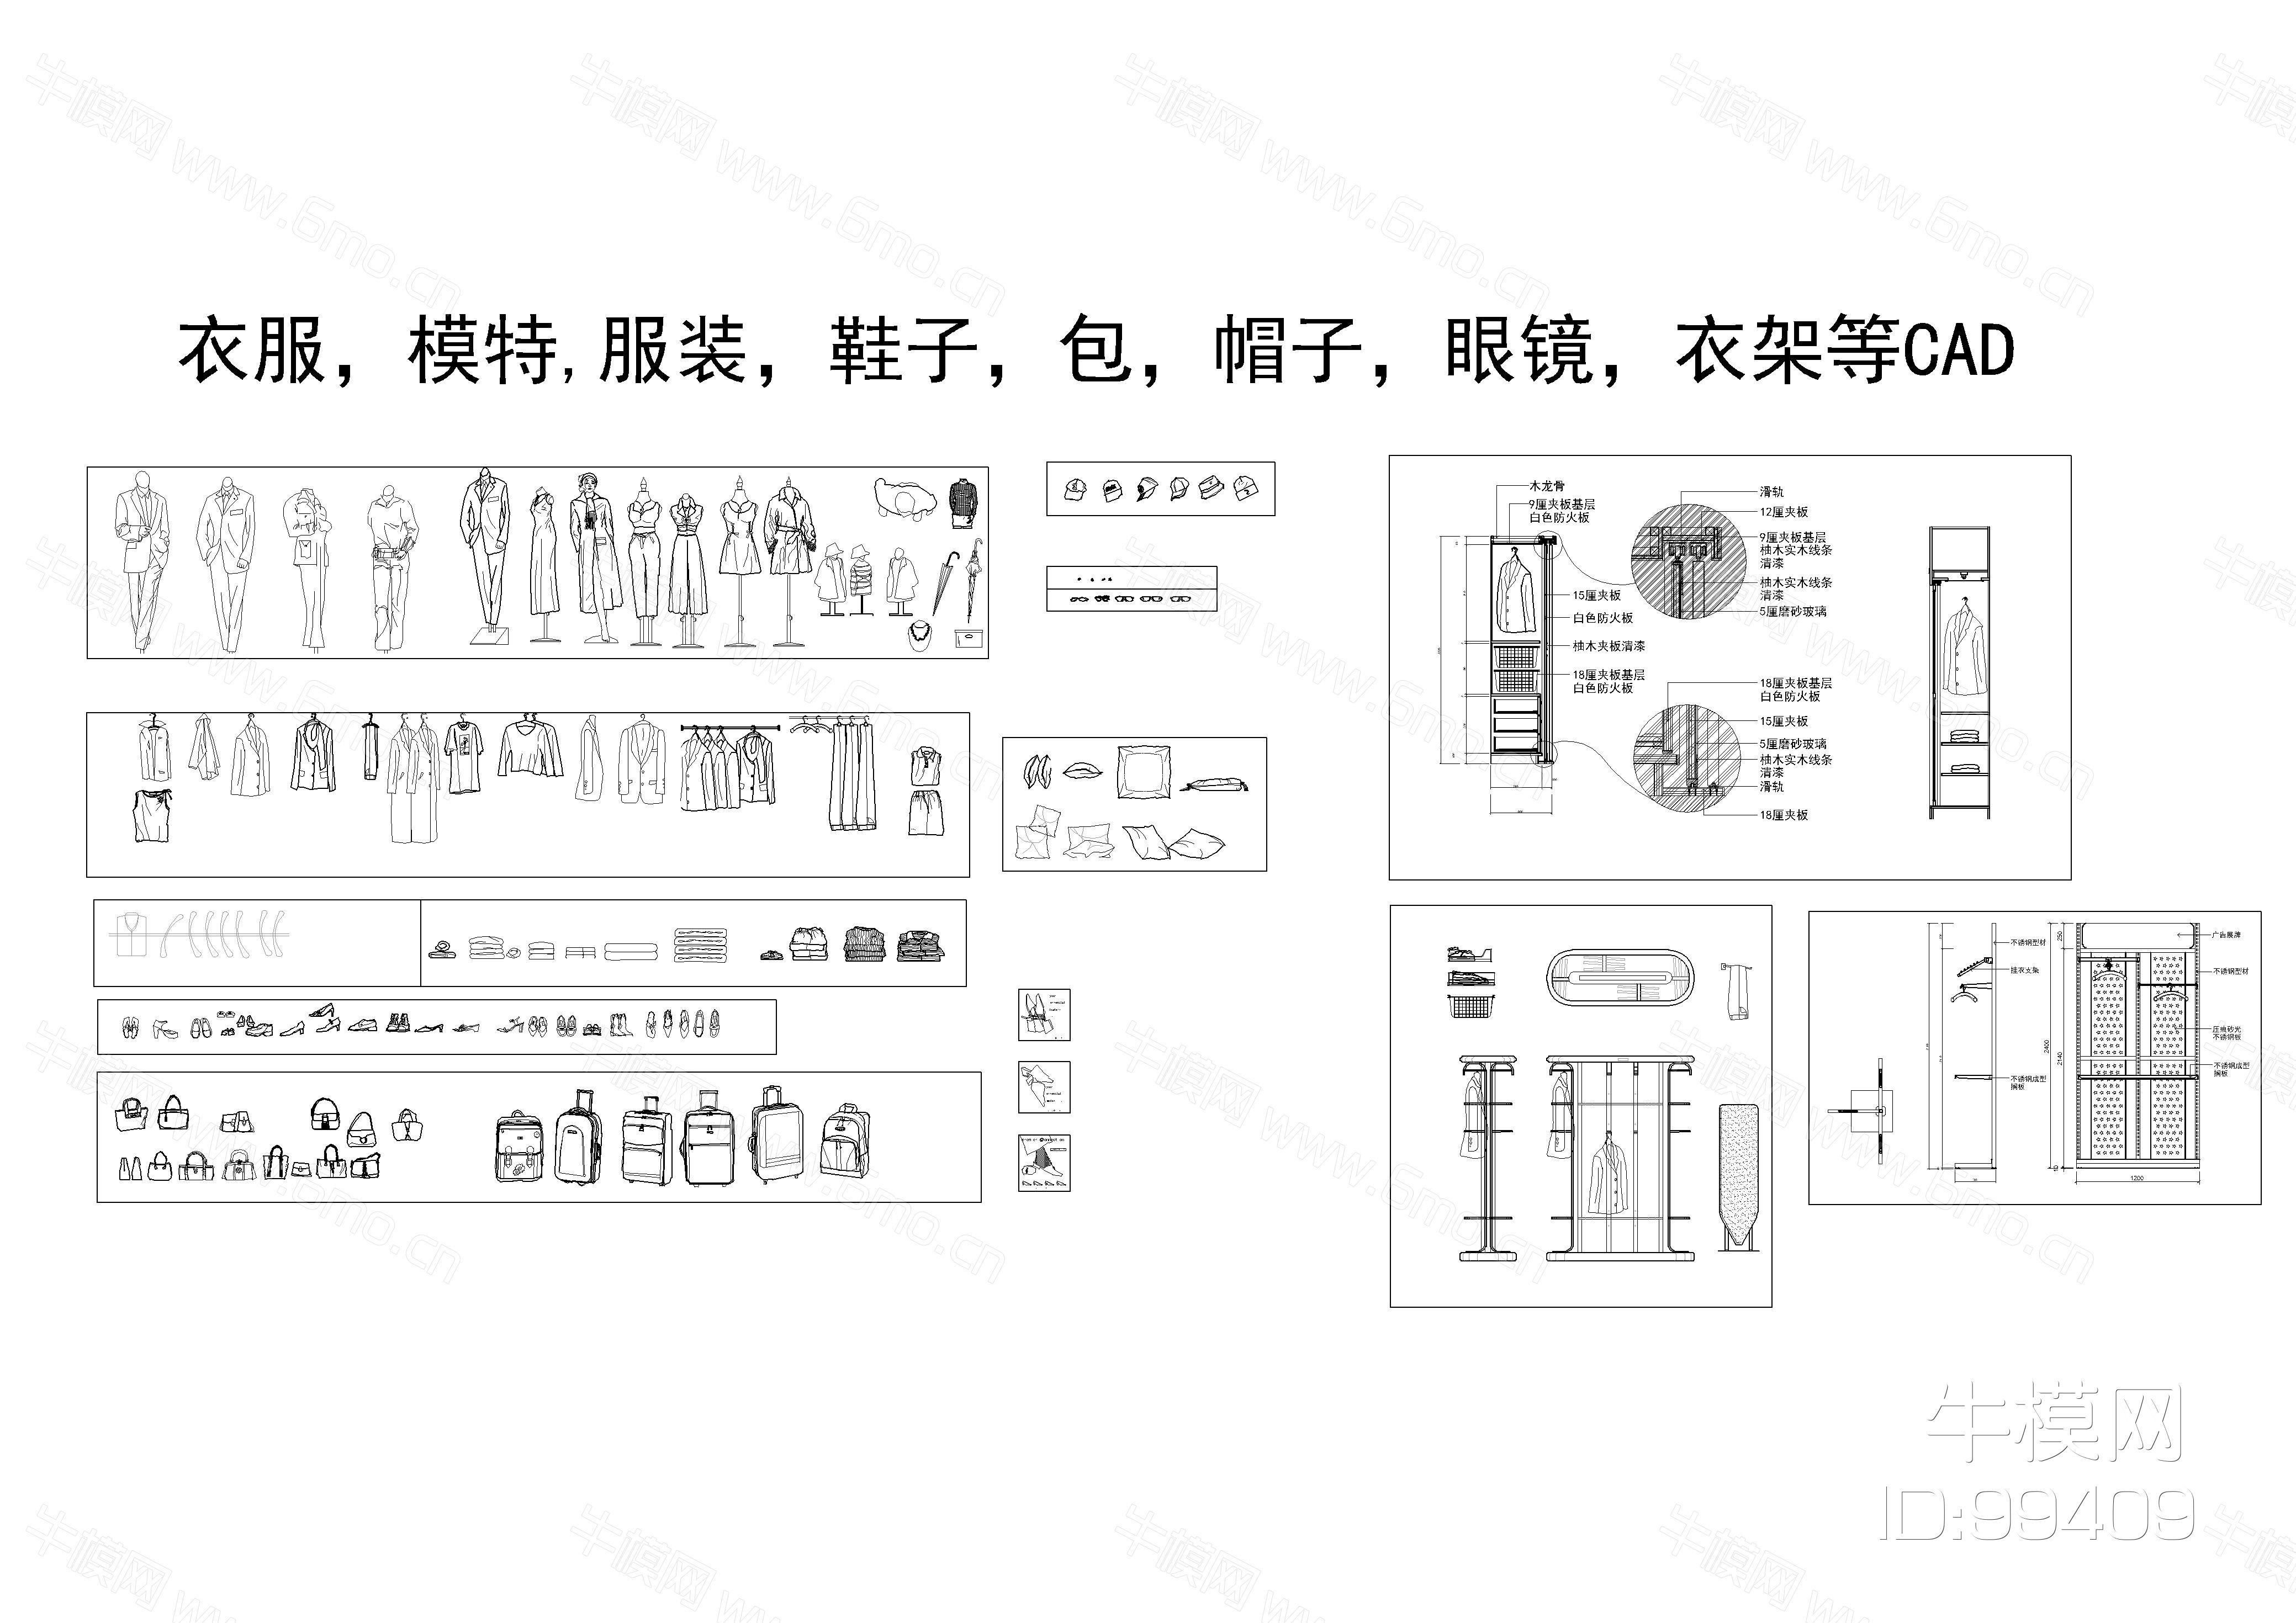 CAD模特衣服服饰鞋子包帽子眼镜衣架系列图库